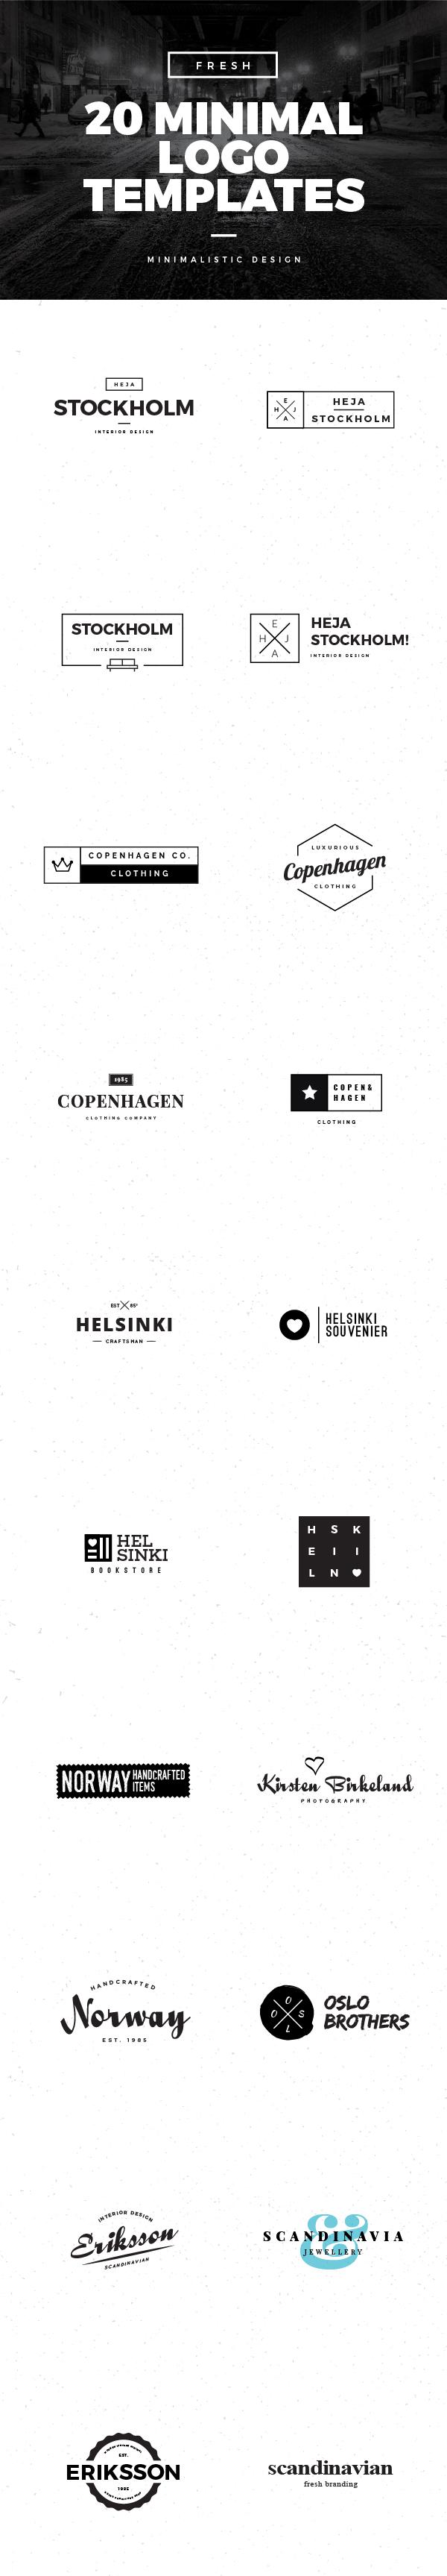 20 Minimal Logo Templates